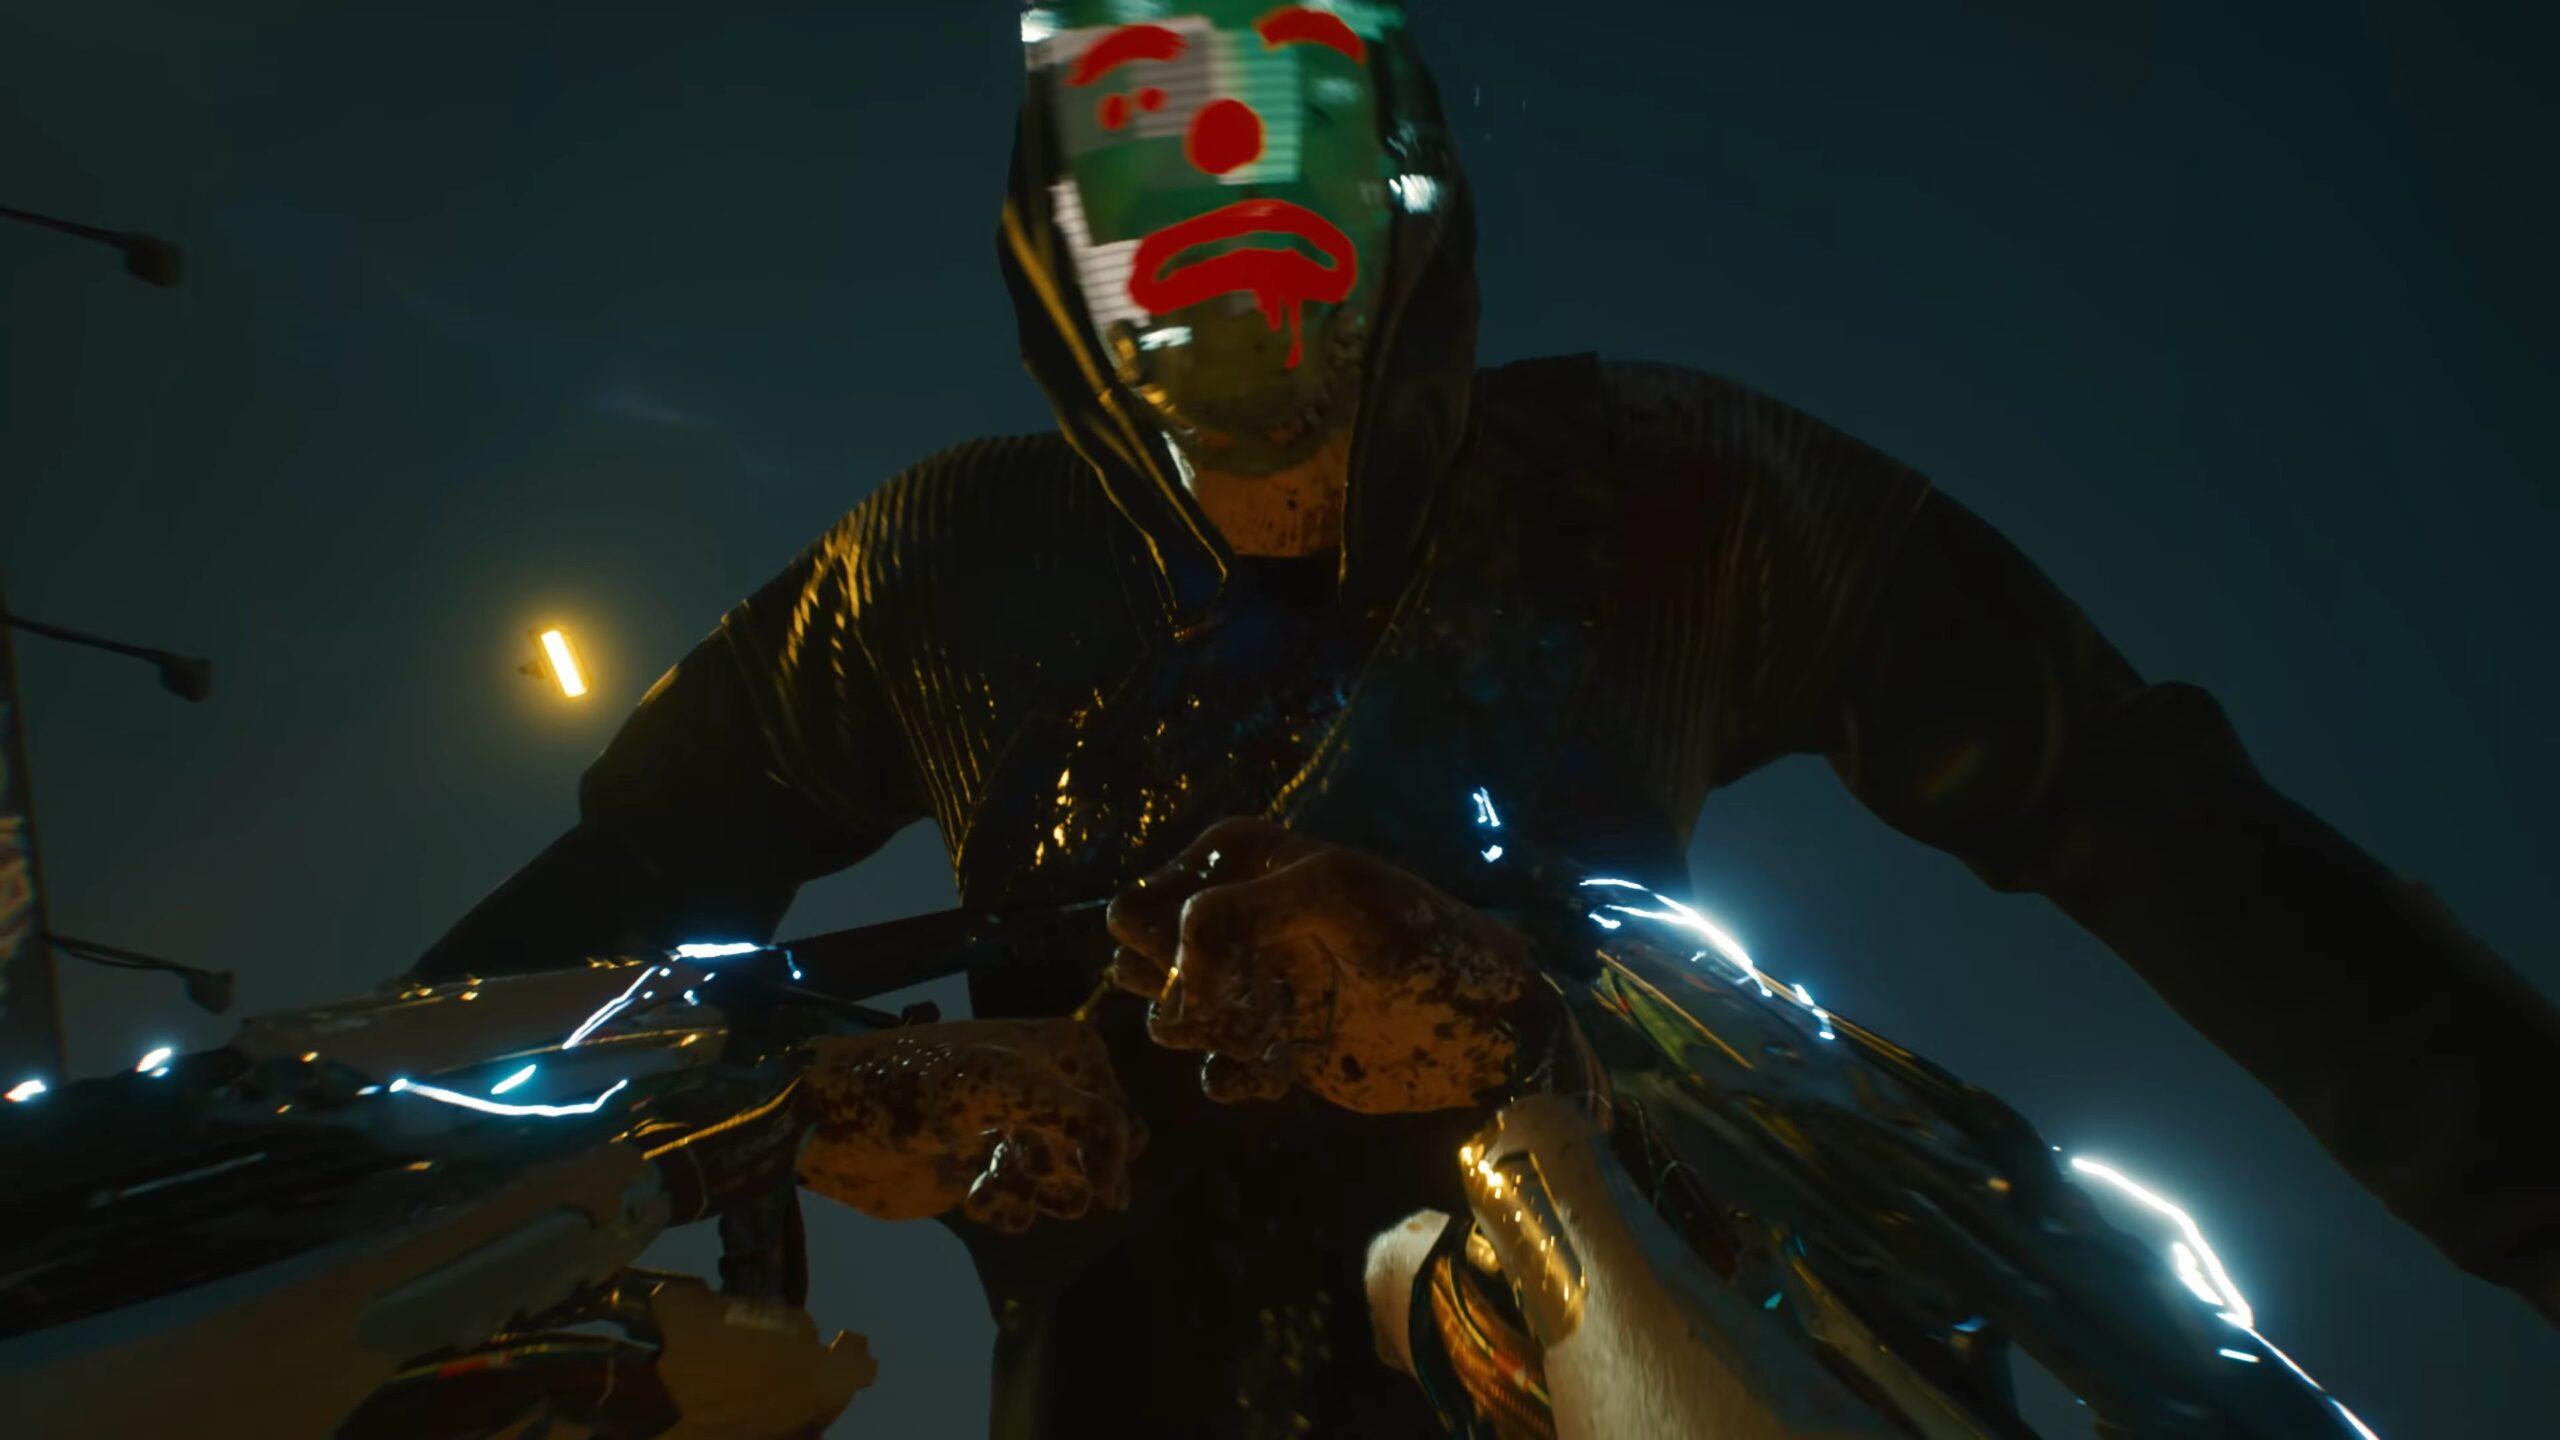 Cyberpunk 2077 Mantis Blades Combat Animation Cyberware Weapon